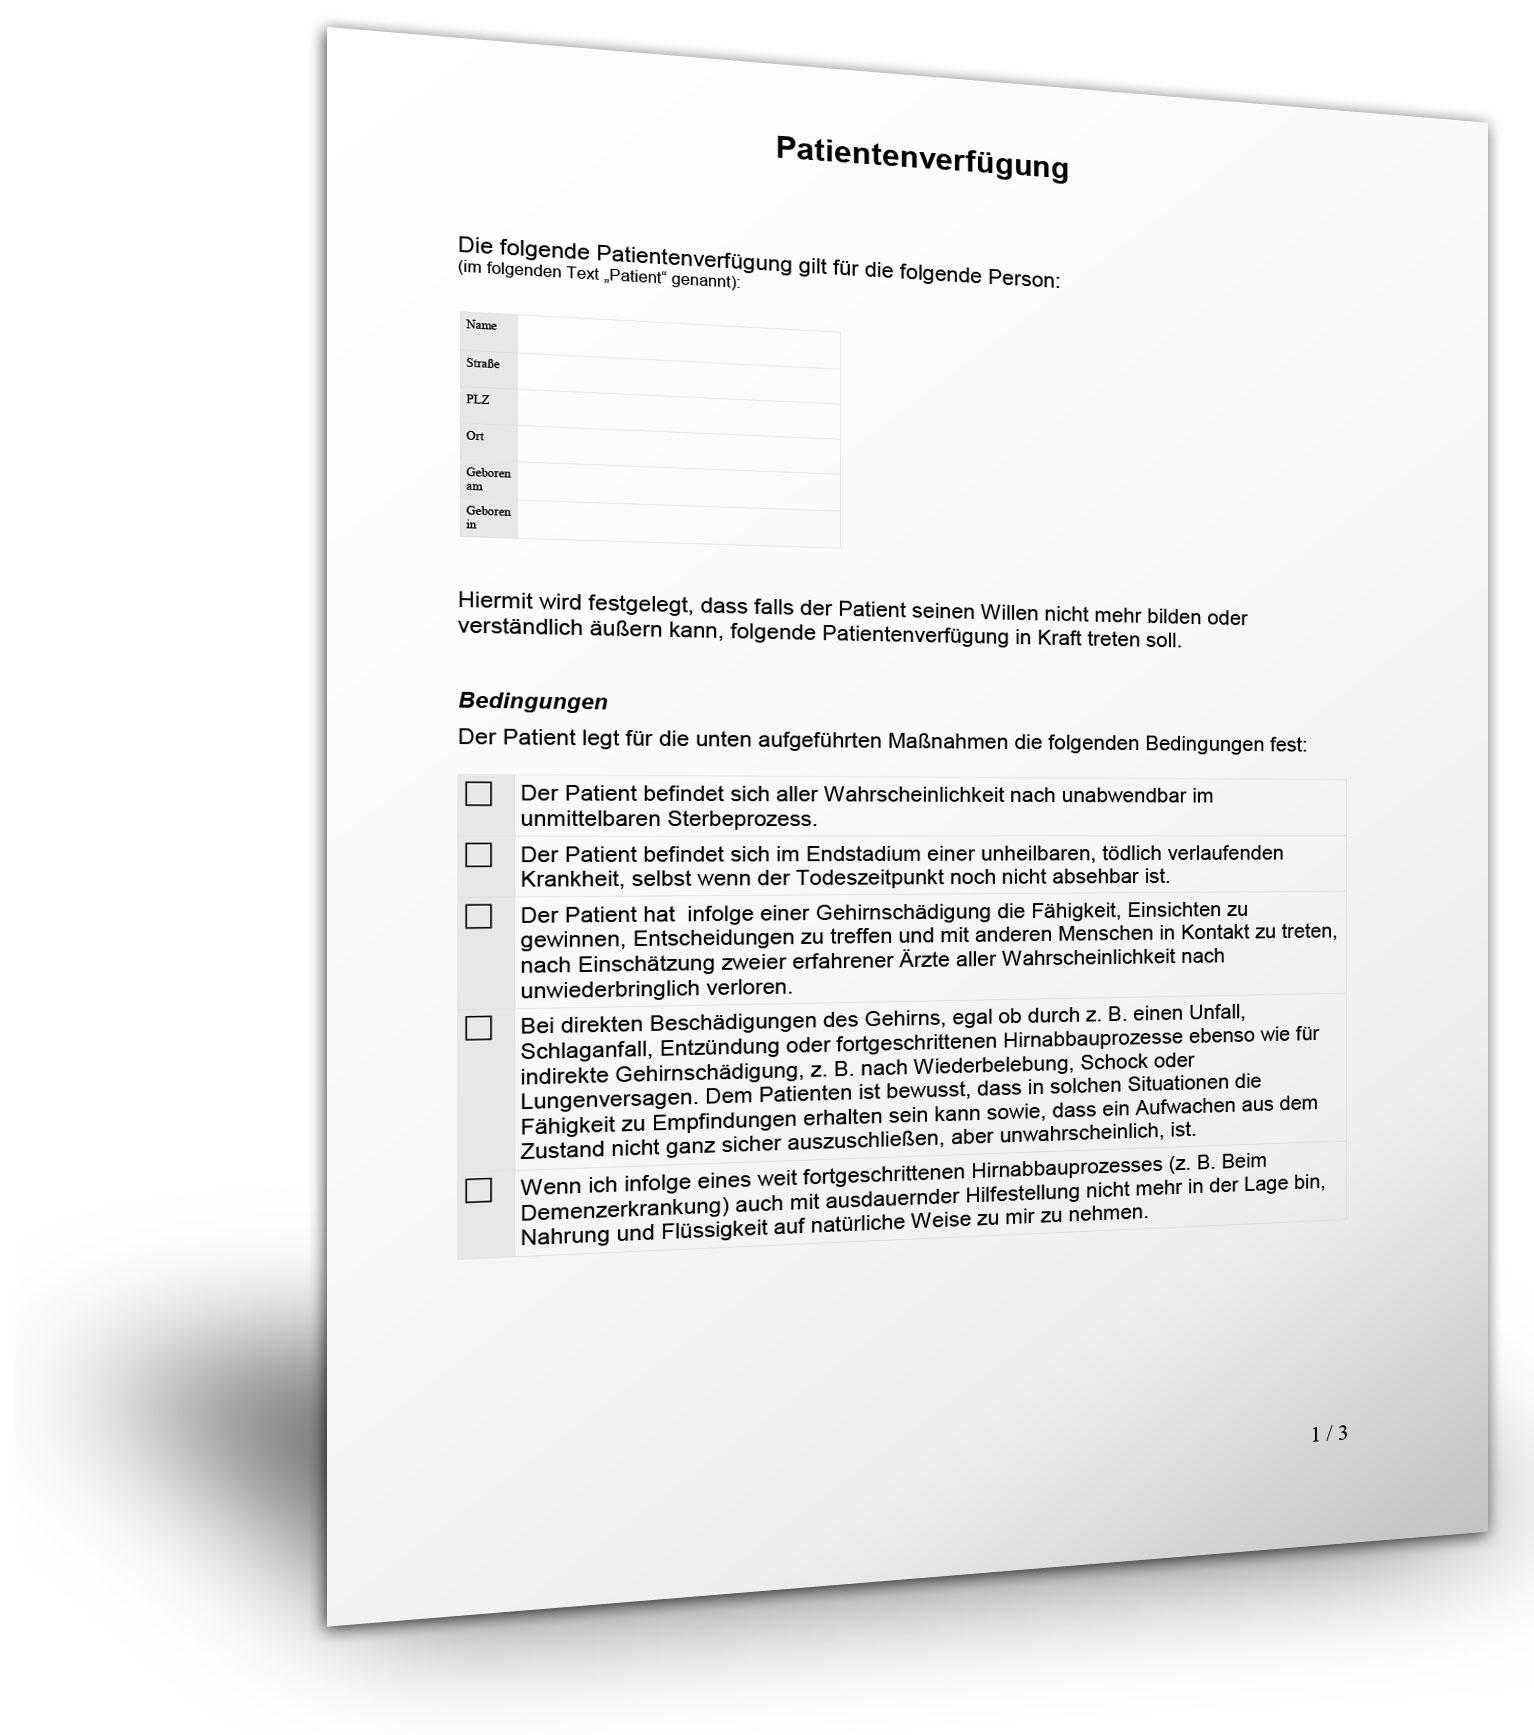 patientenverfuegungsformular muster - Muster Patientenverfugung